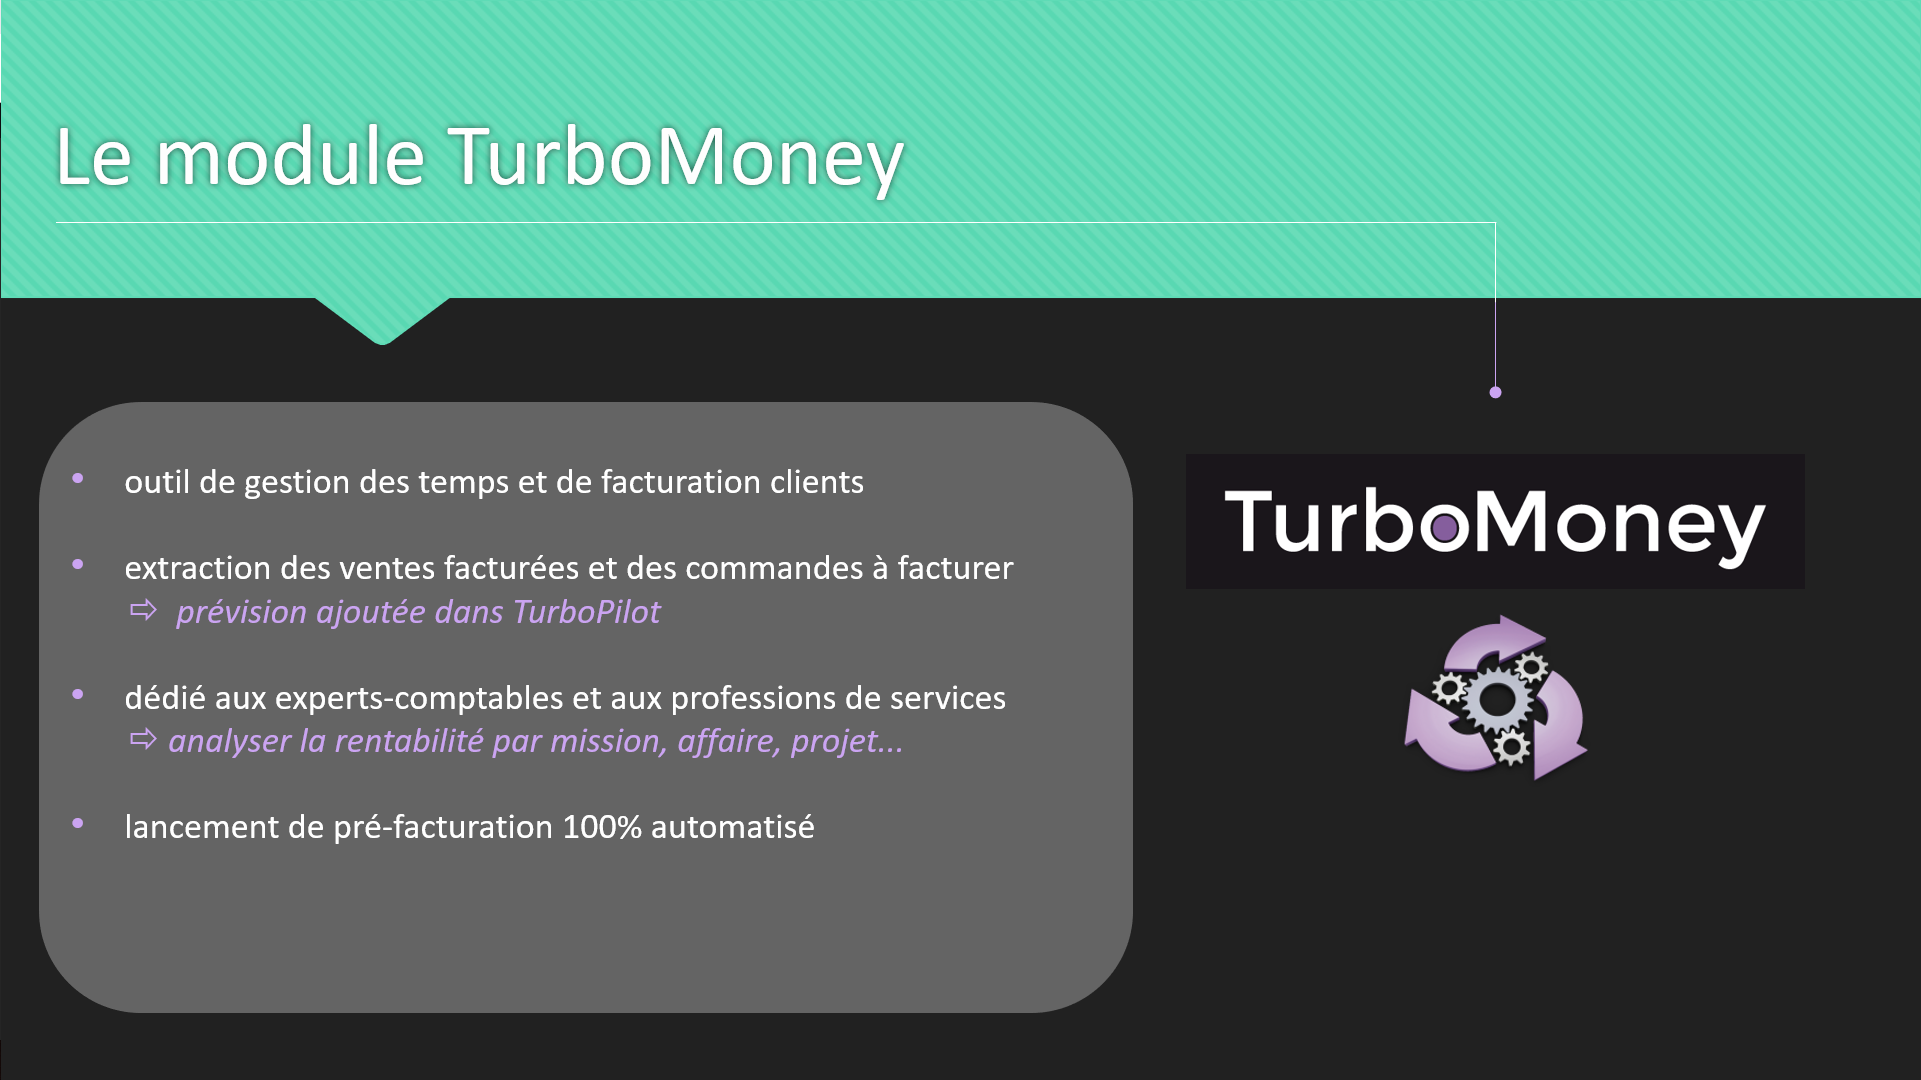 Le module TurboMoney